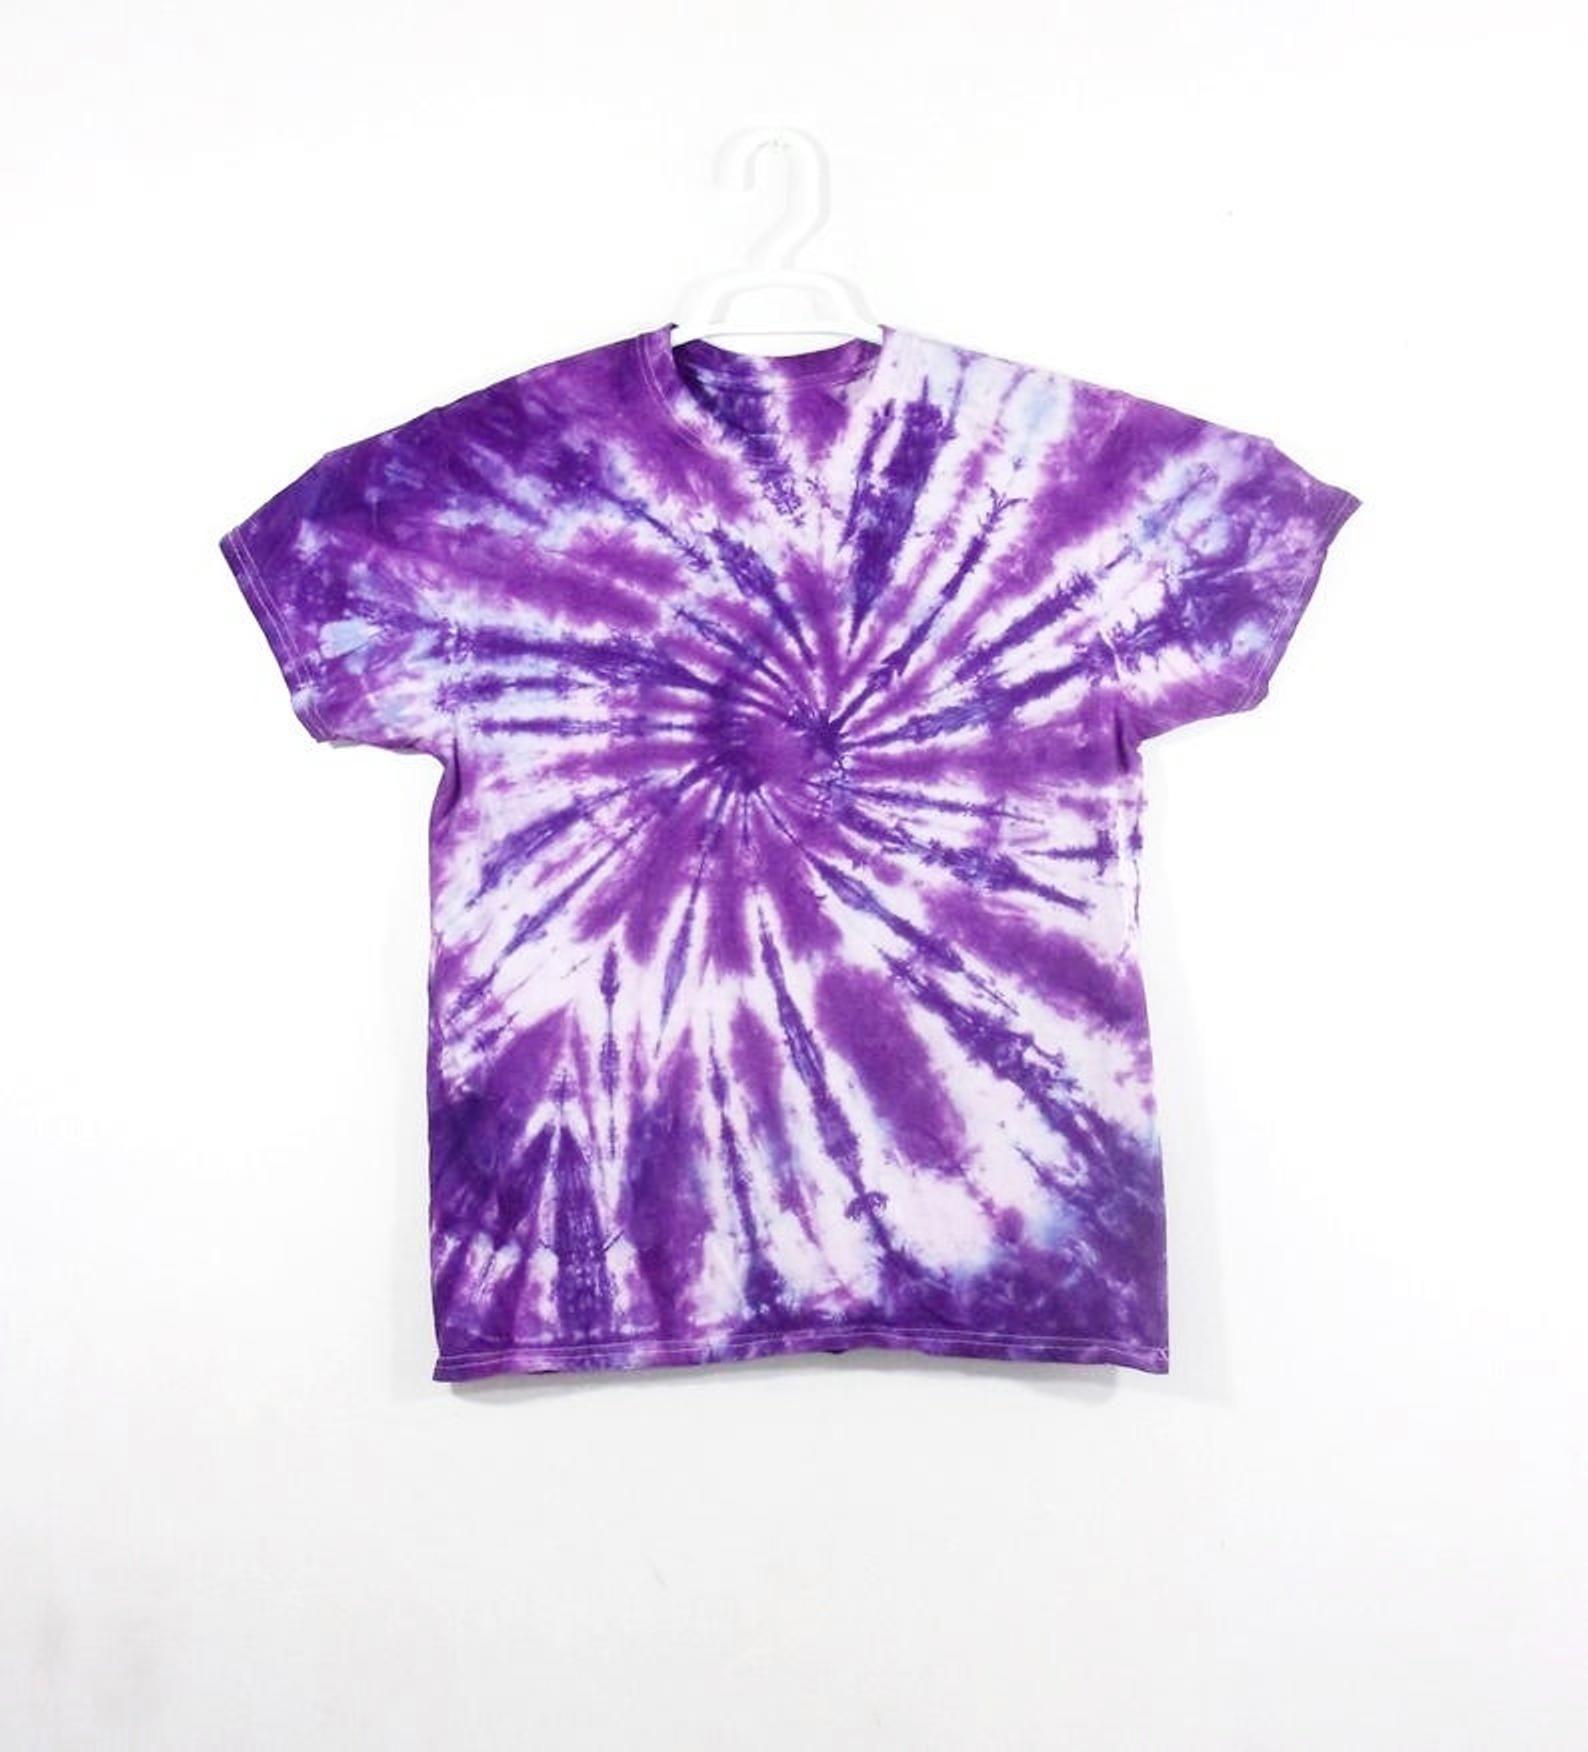 Tie Dye T Shirt Spiral Handmade Tye Die Kids Youth Sizes XS S M L XL